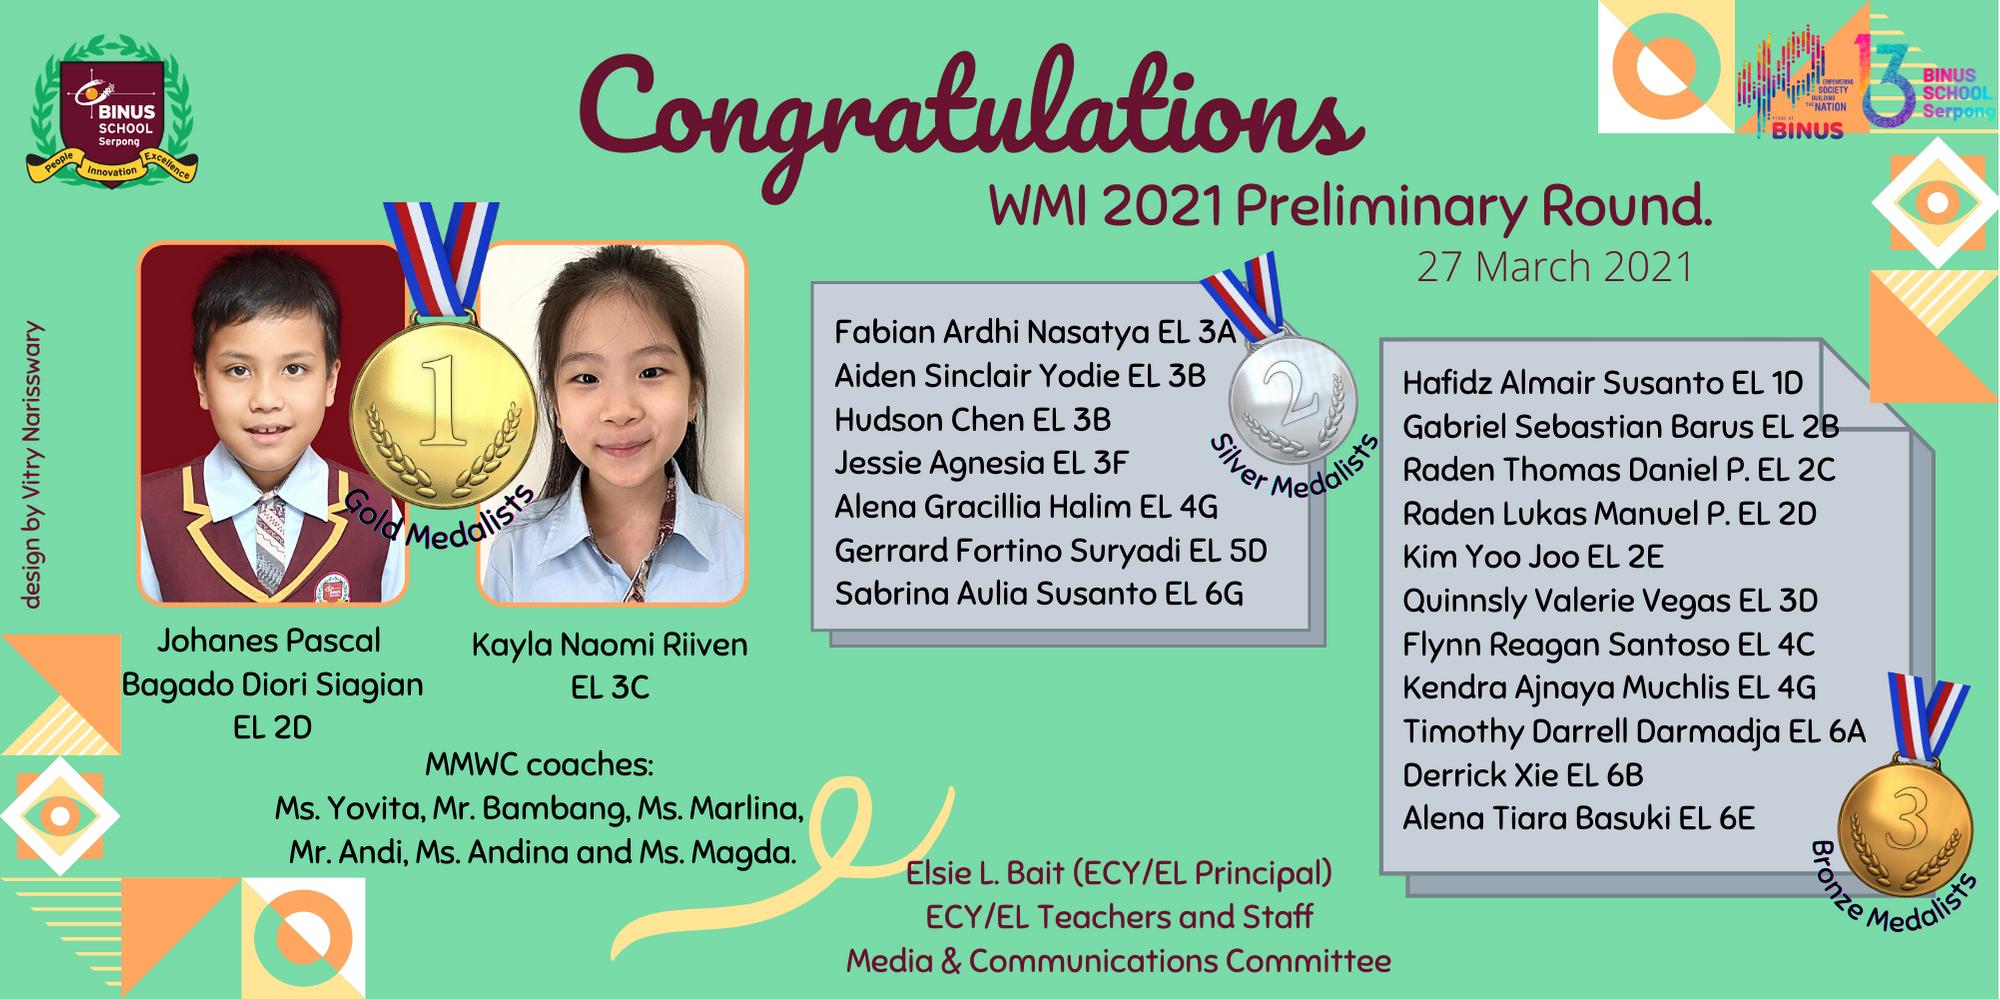 WMI 2021 Preliminary Round